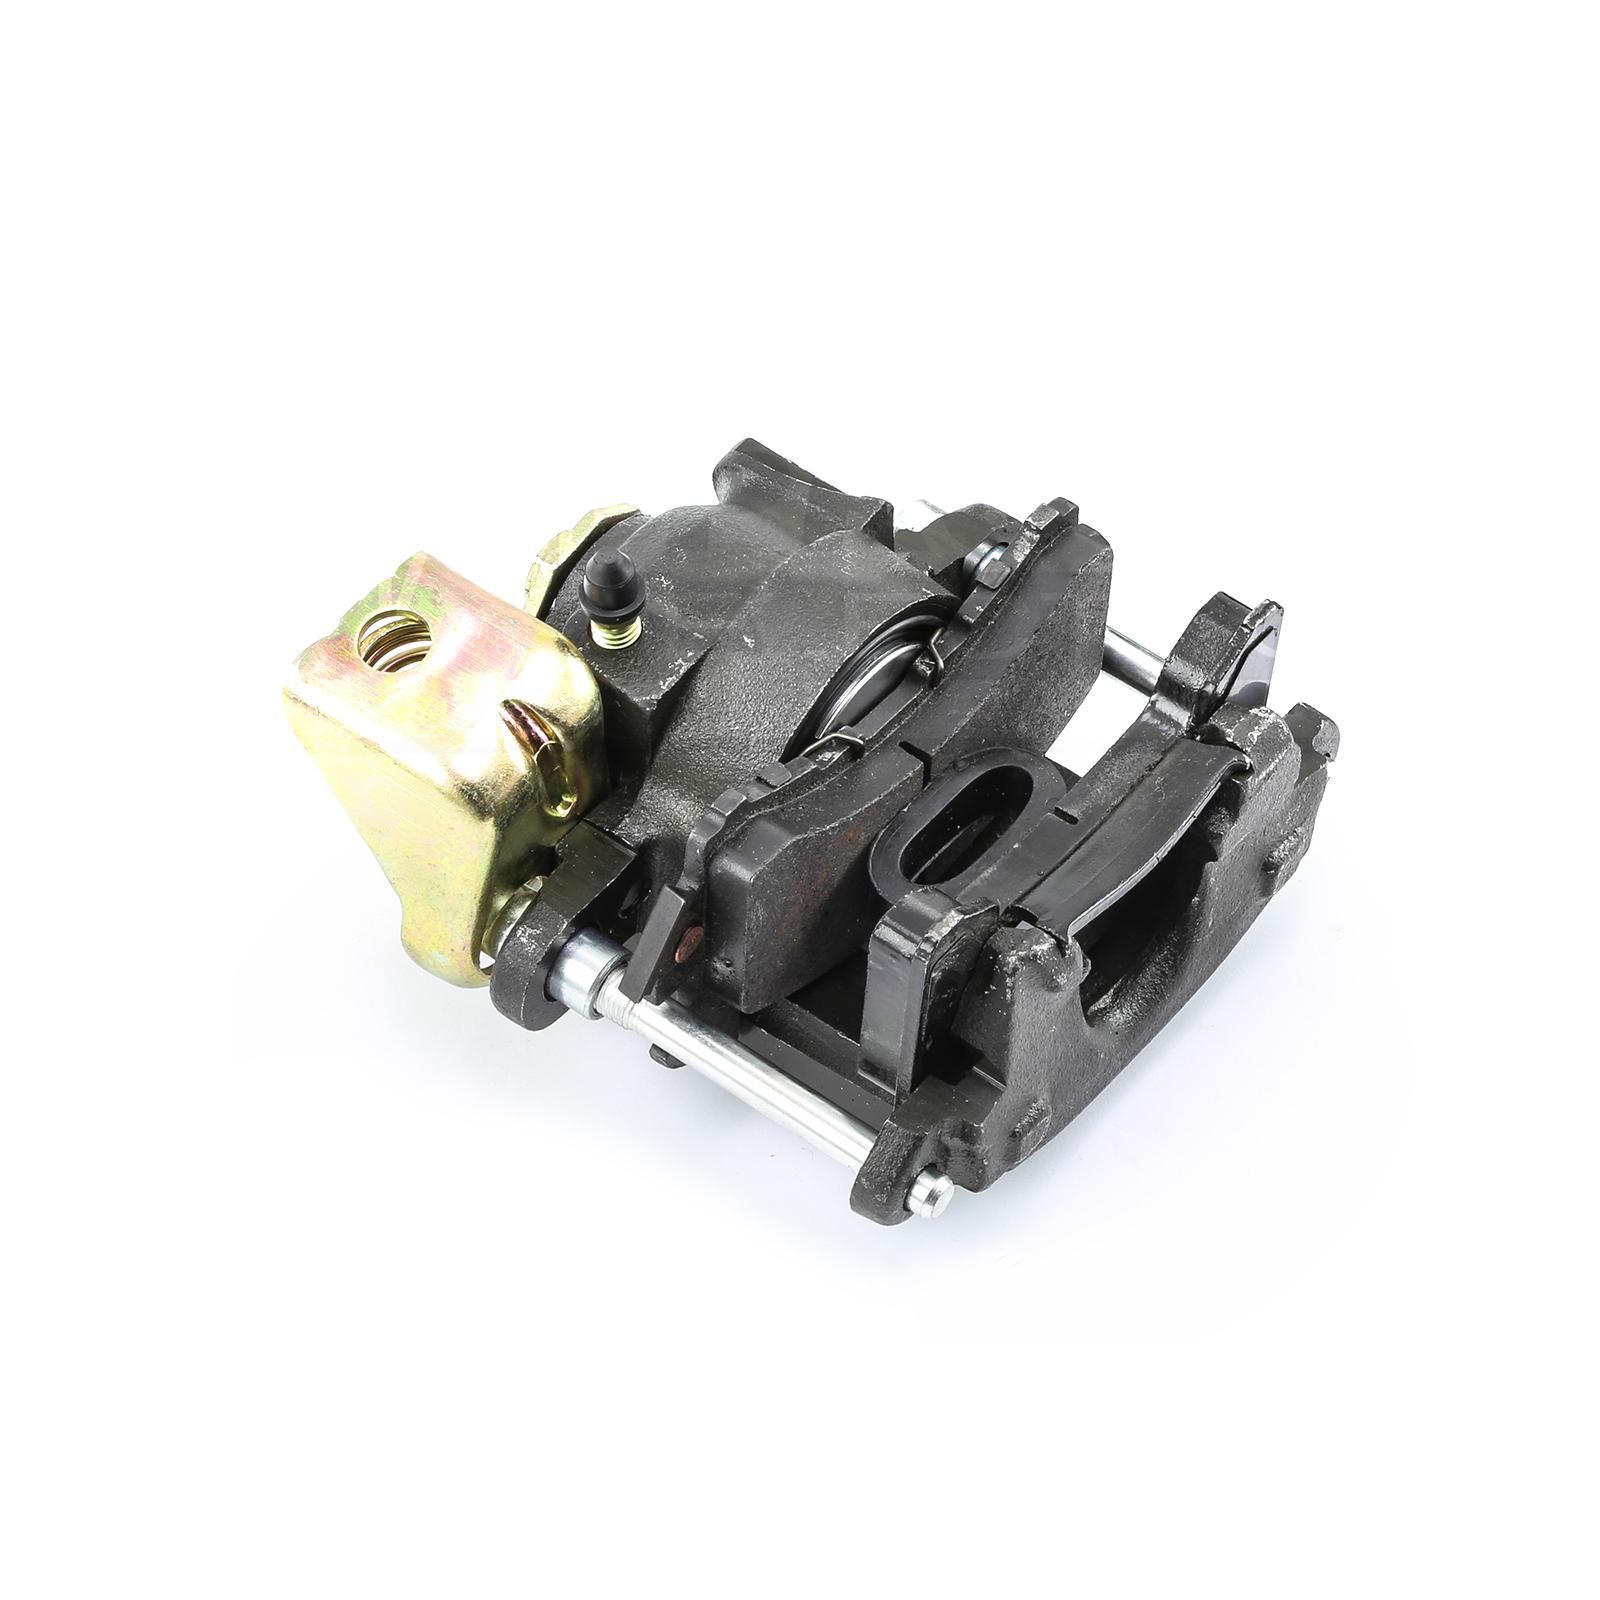 "GM Rear Metric Caliper w/Emergency Brake 5"" Pin RH Side 7/16"" Inlet"